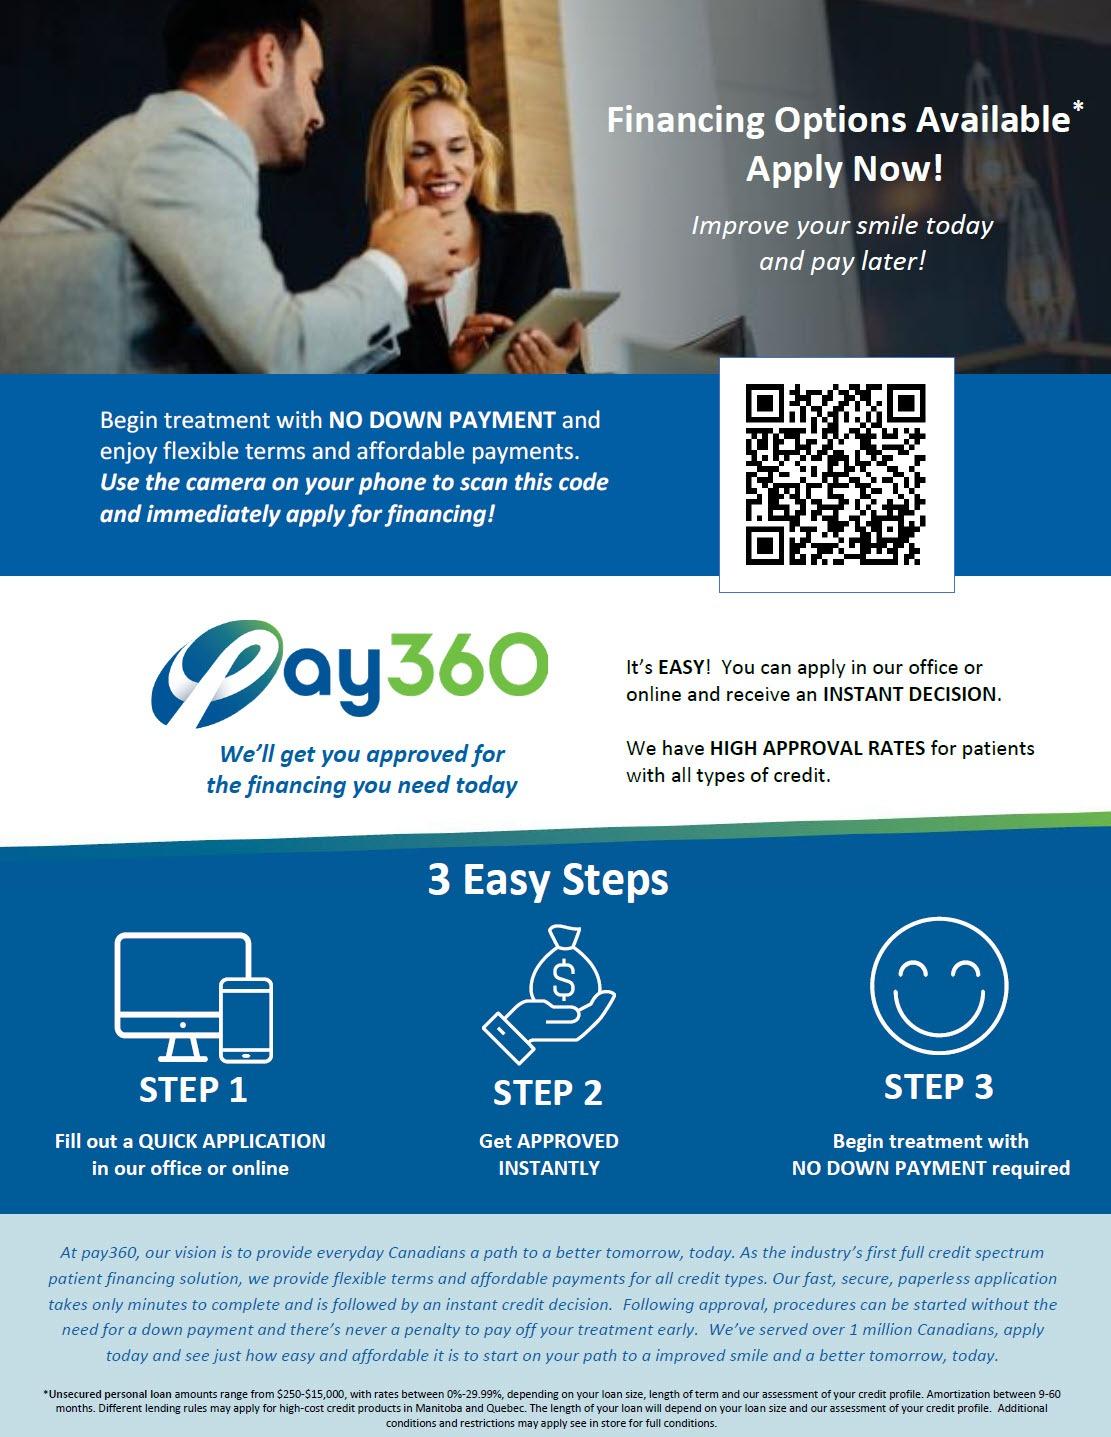 Pay360 Financing for Dental Procedures | Calgary Dentist